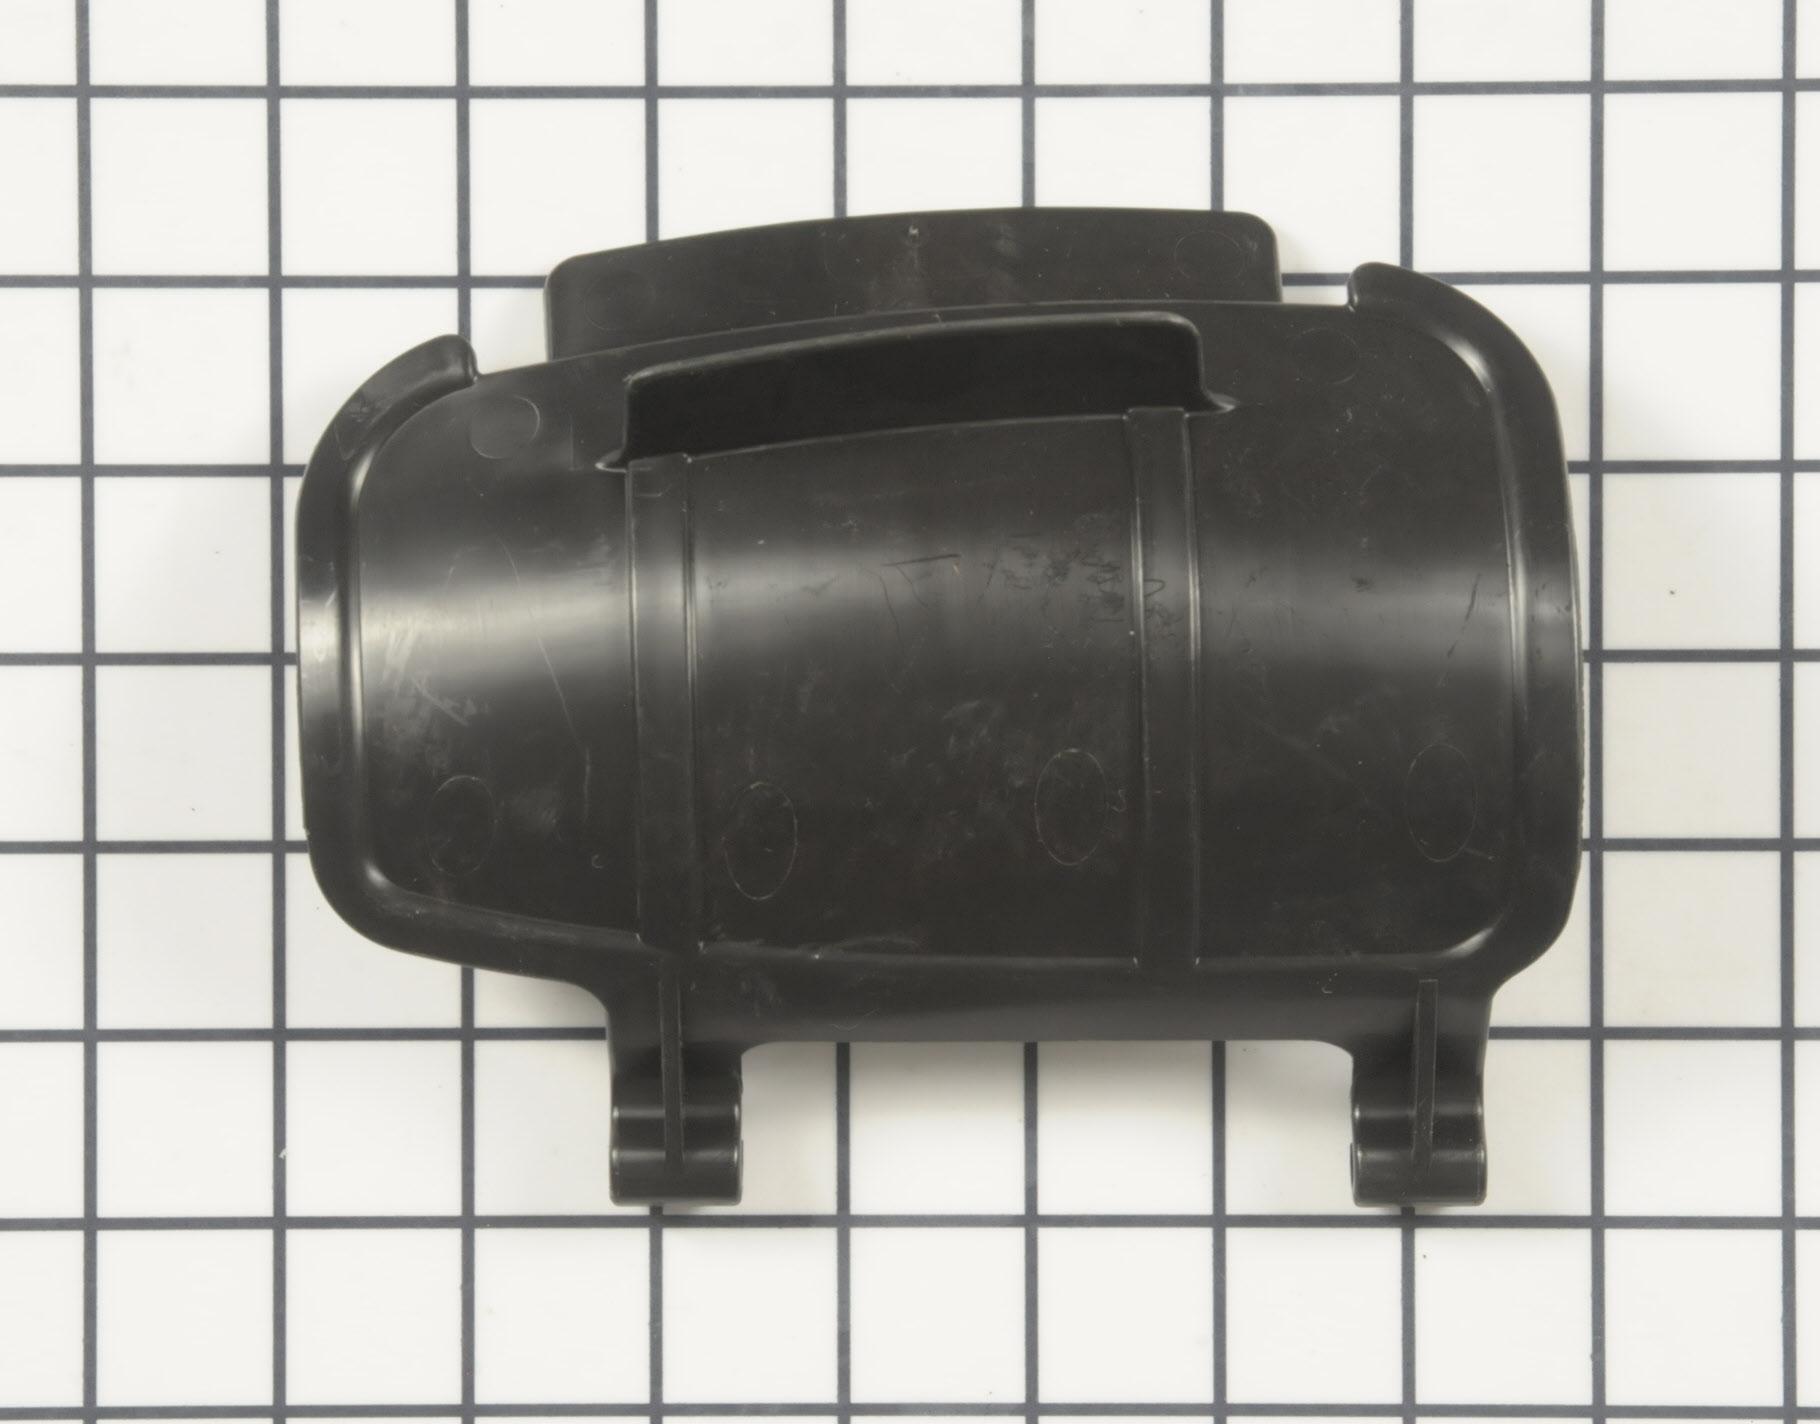 532160830 Poulan Pro Lawn Mower Part -Discharge Chute